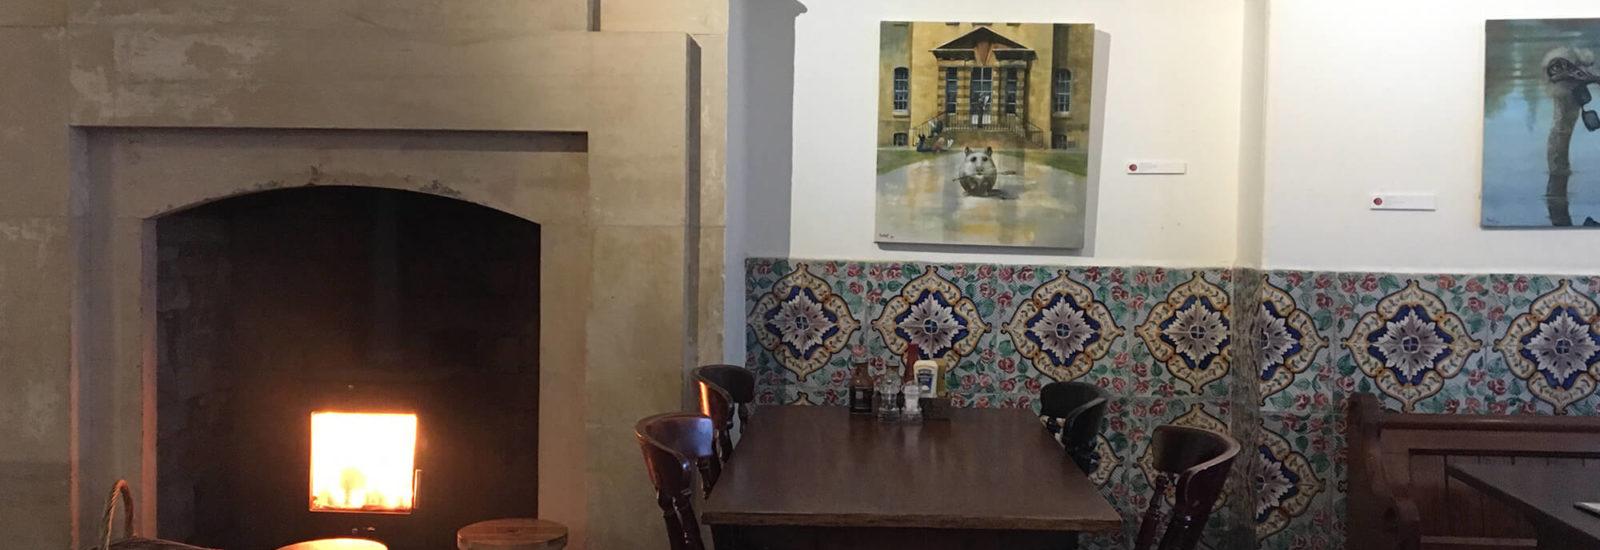 Image of Kings Weston House Café